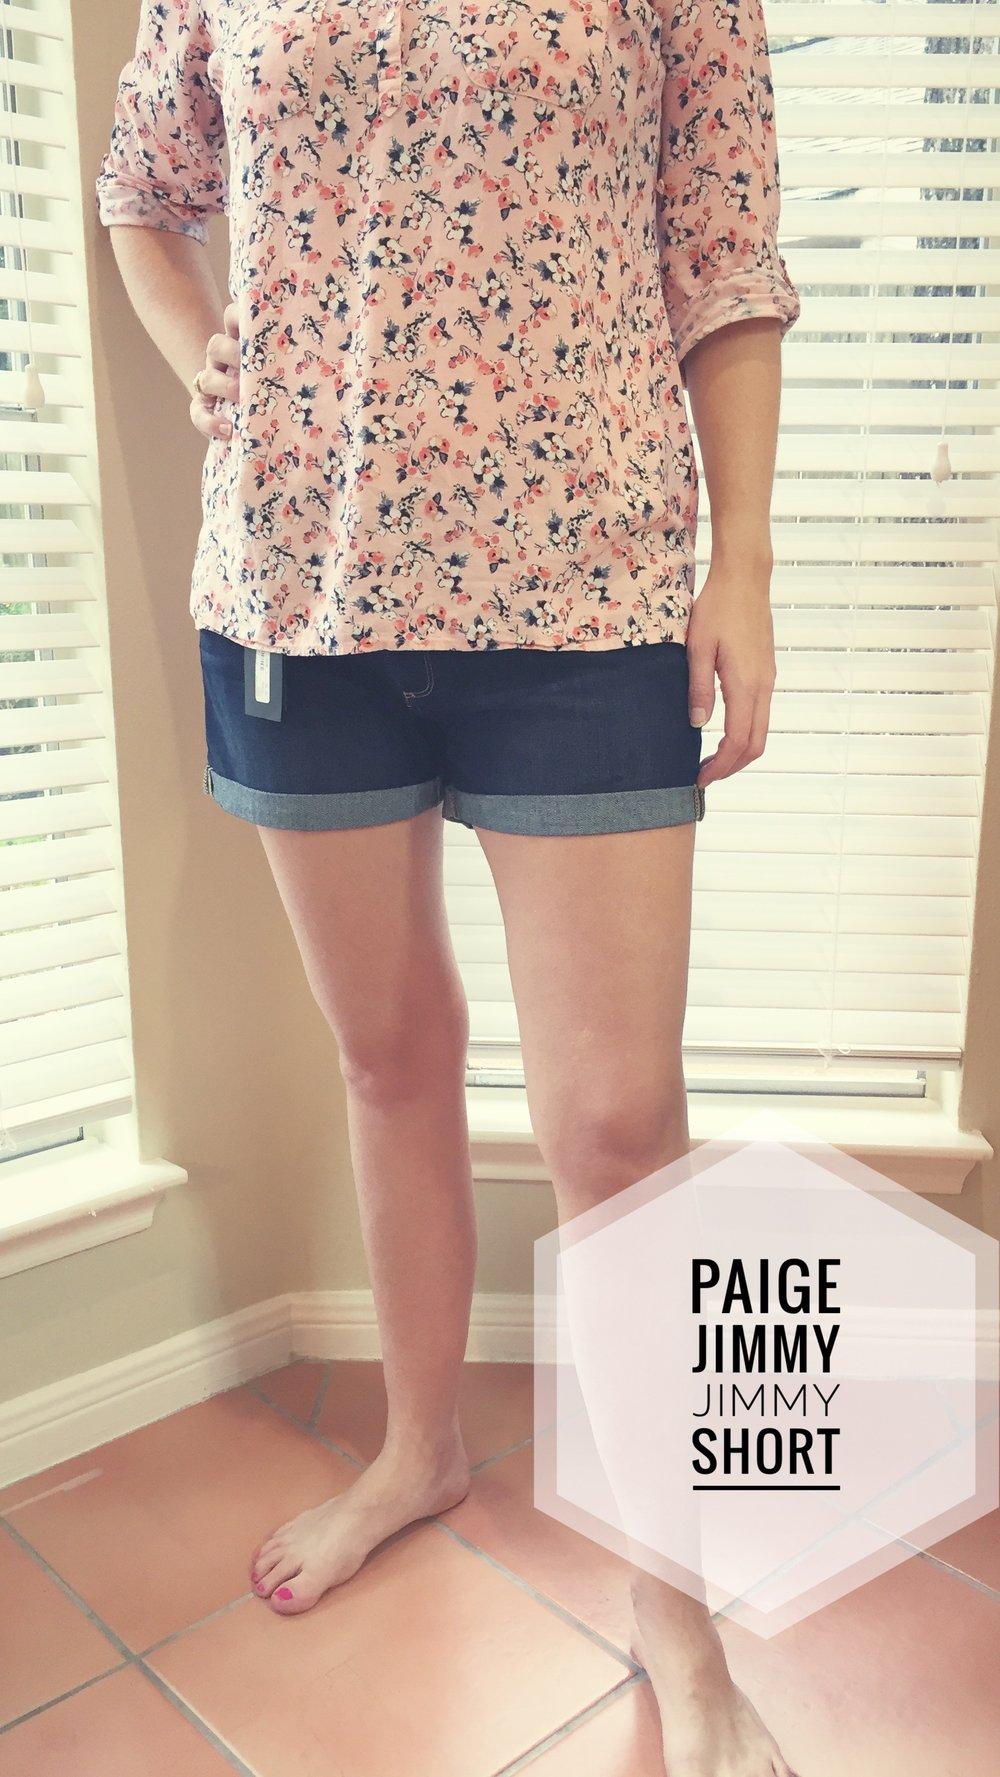 Maternity Jeans Test, Lisa Rutledge Midwife - 14.jpg